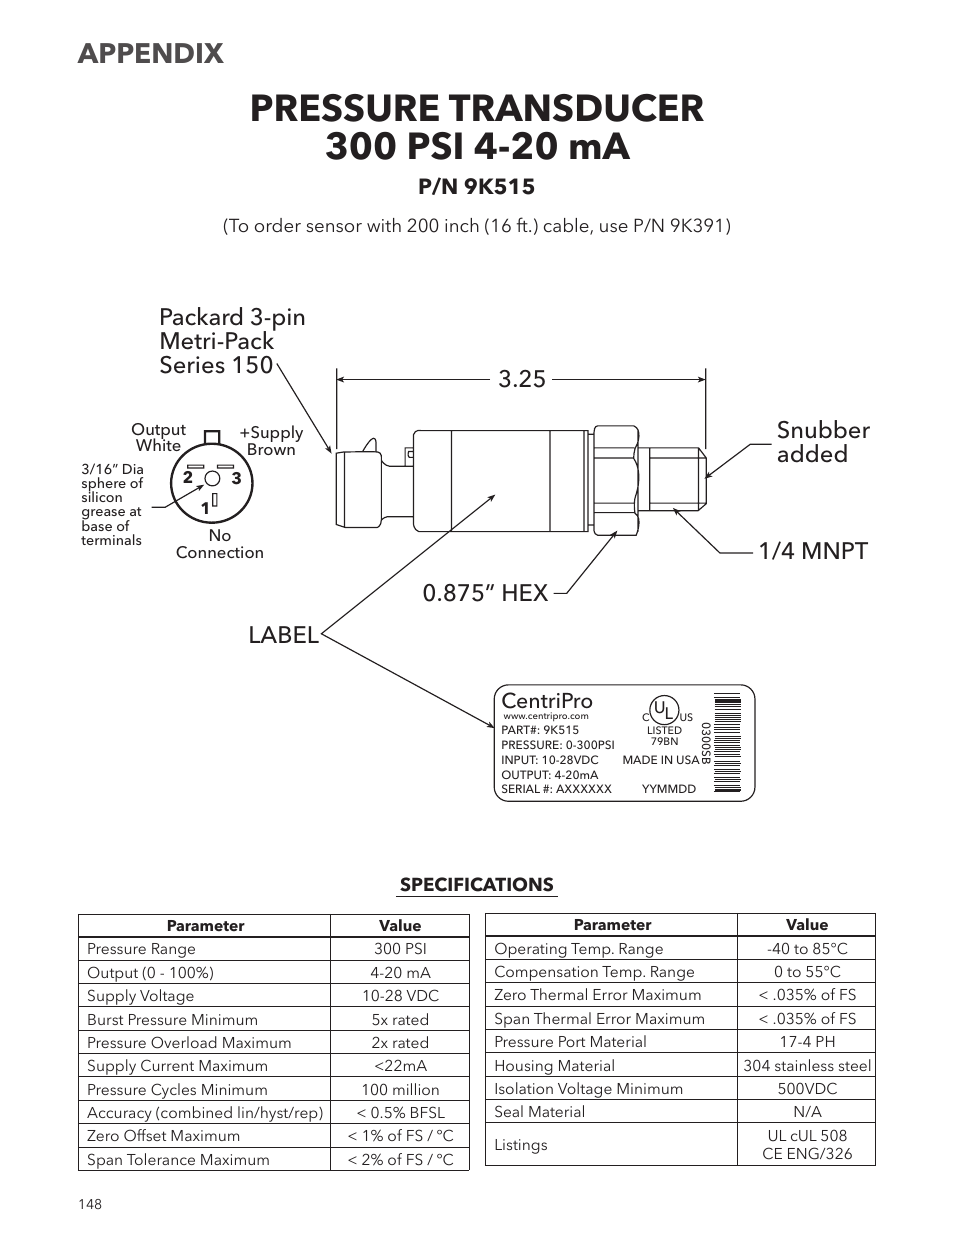 medium resolution of appendix centripro p n 9k515 xylem im167 r8 aquavar cpc centrifugal pump control user manual page 148 152